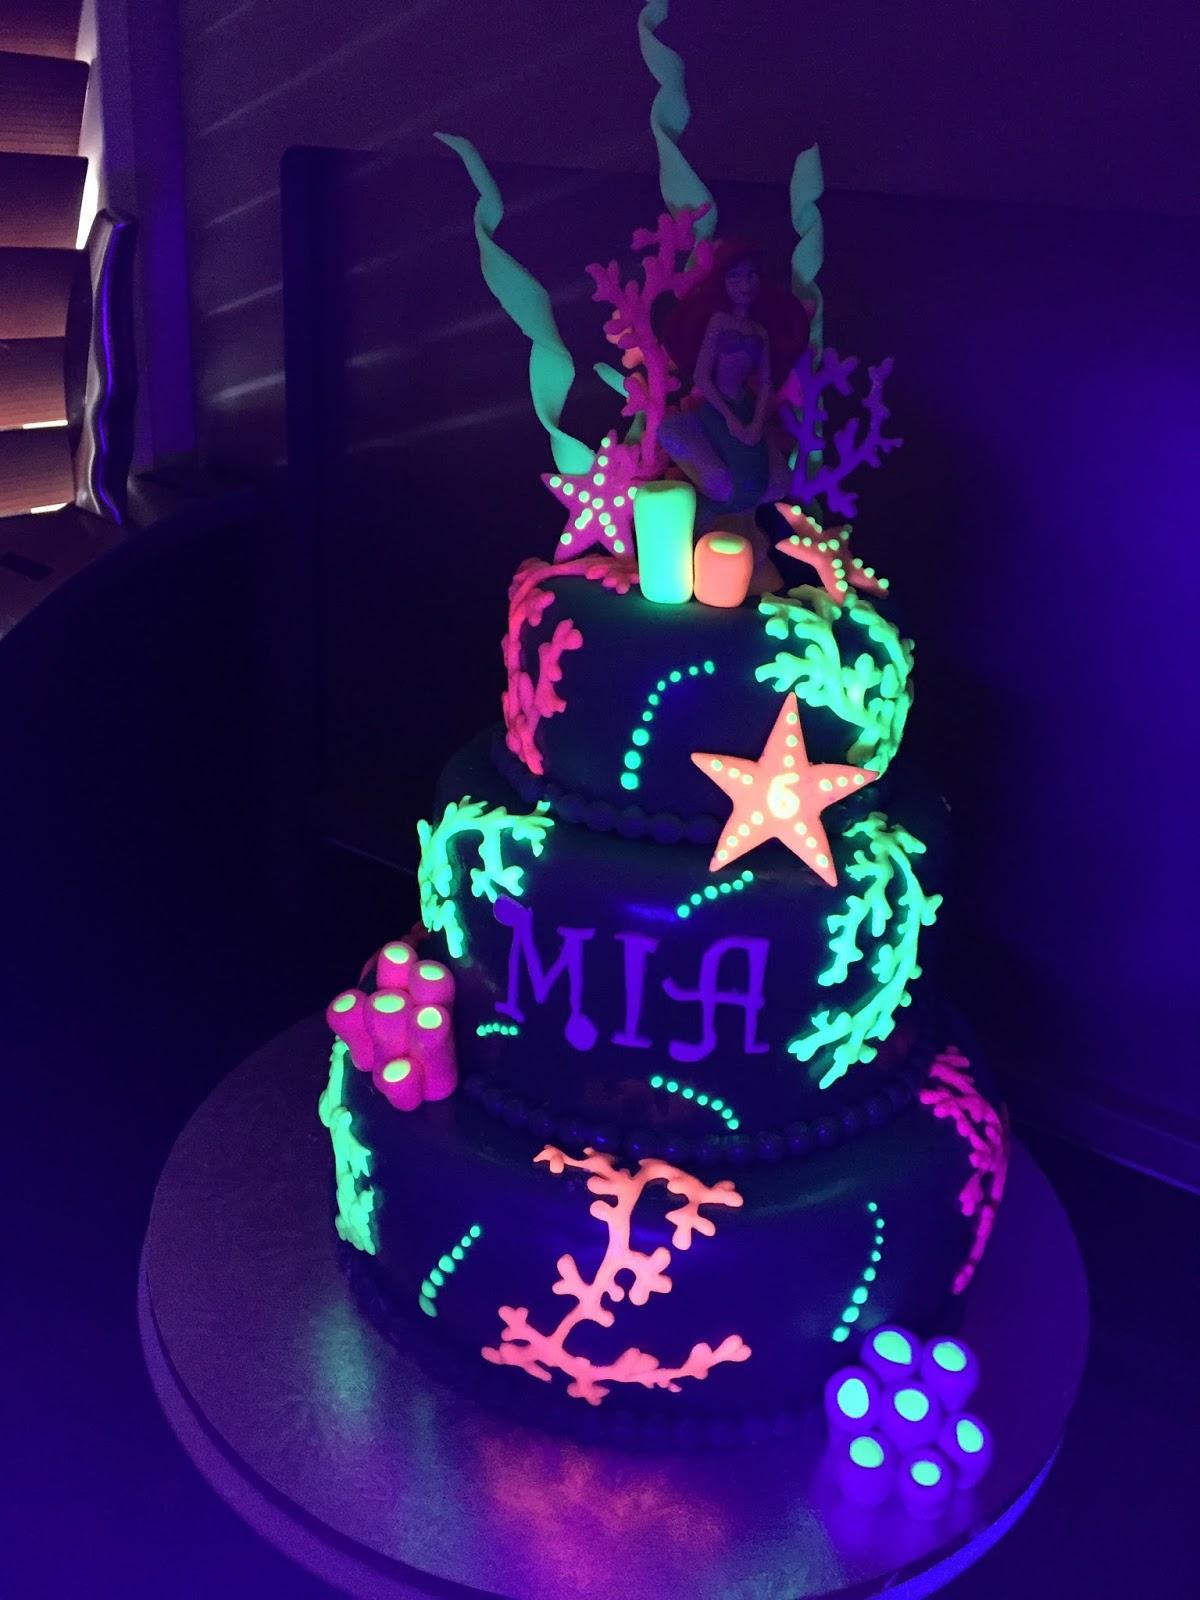 Glow in the Dark Birthday Cake Ideas